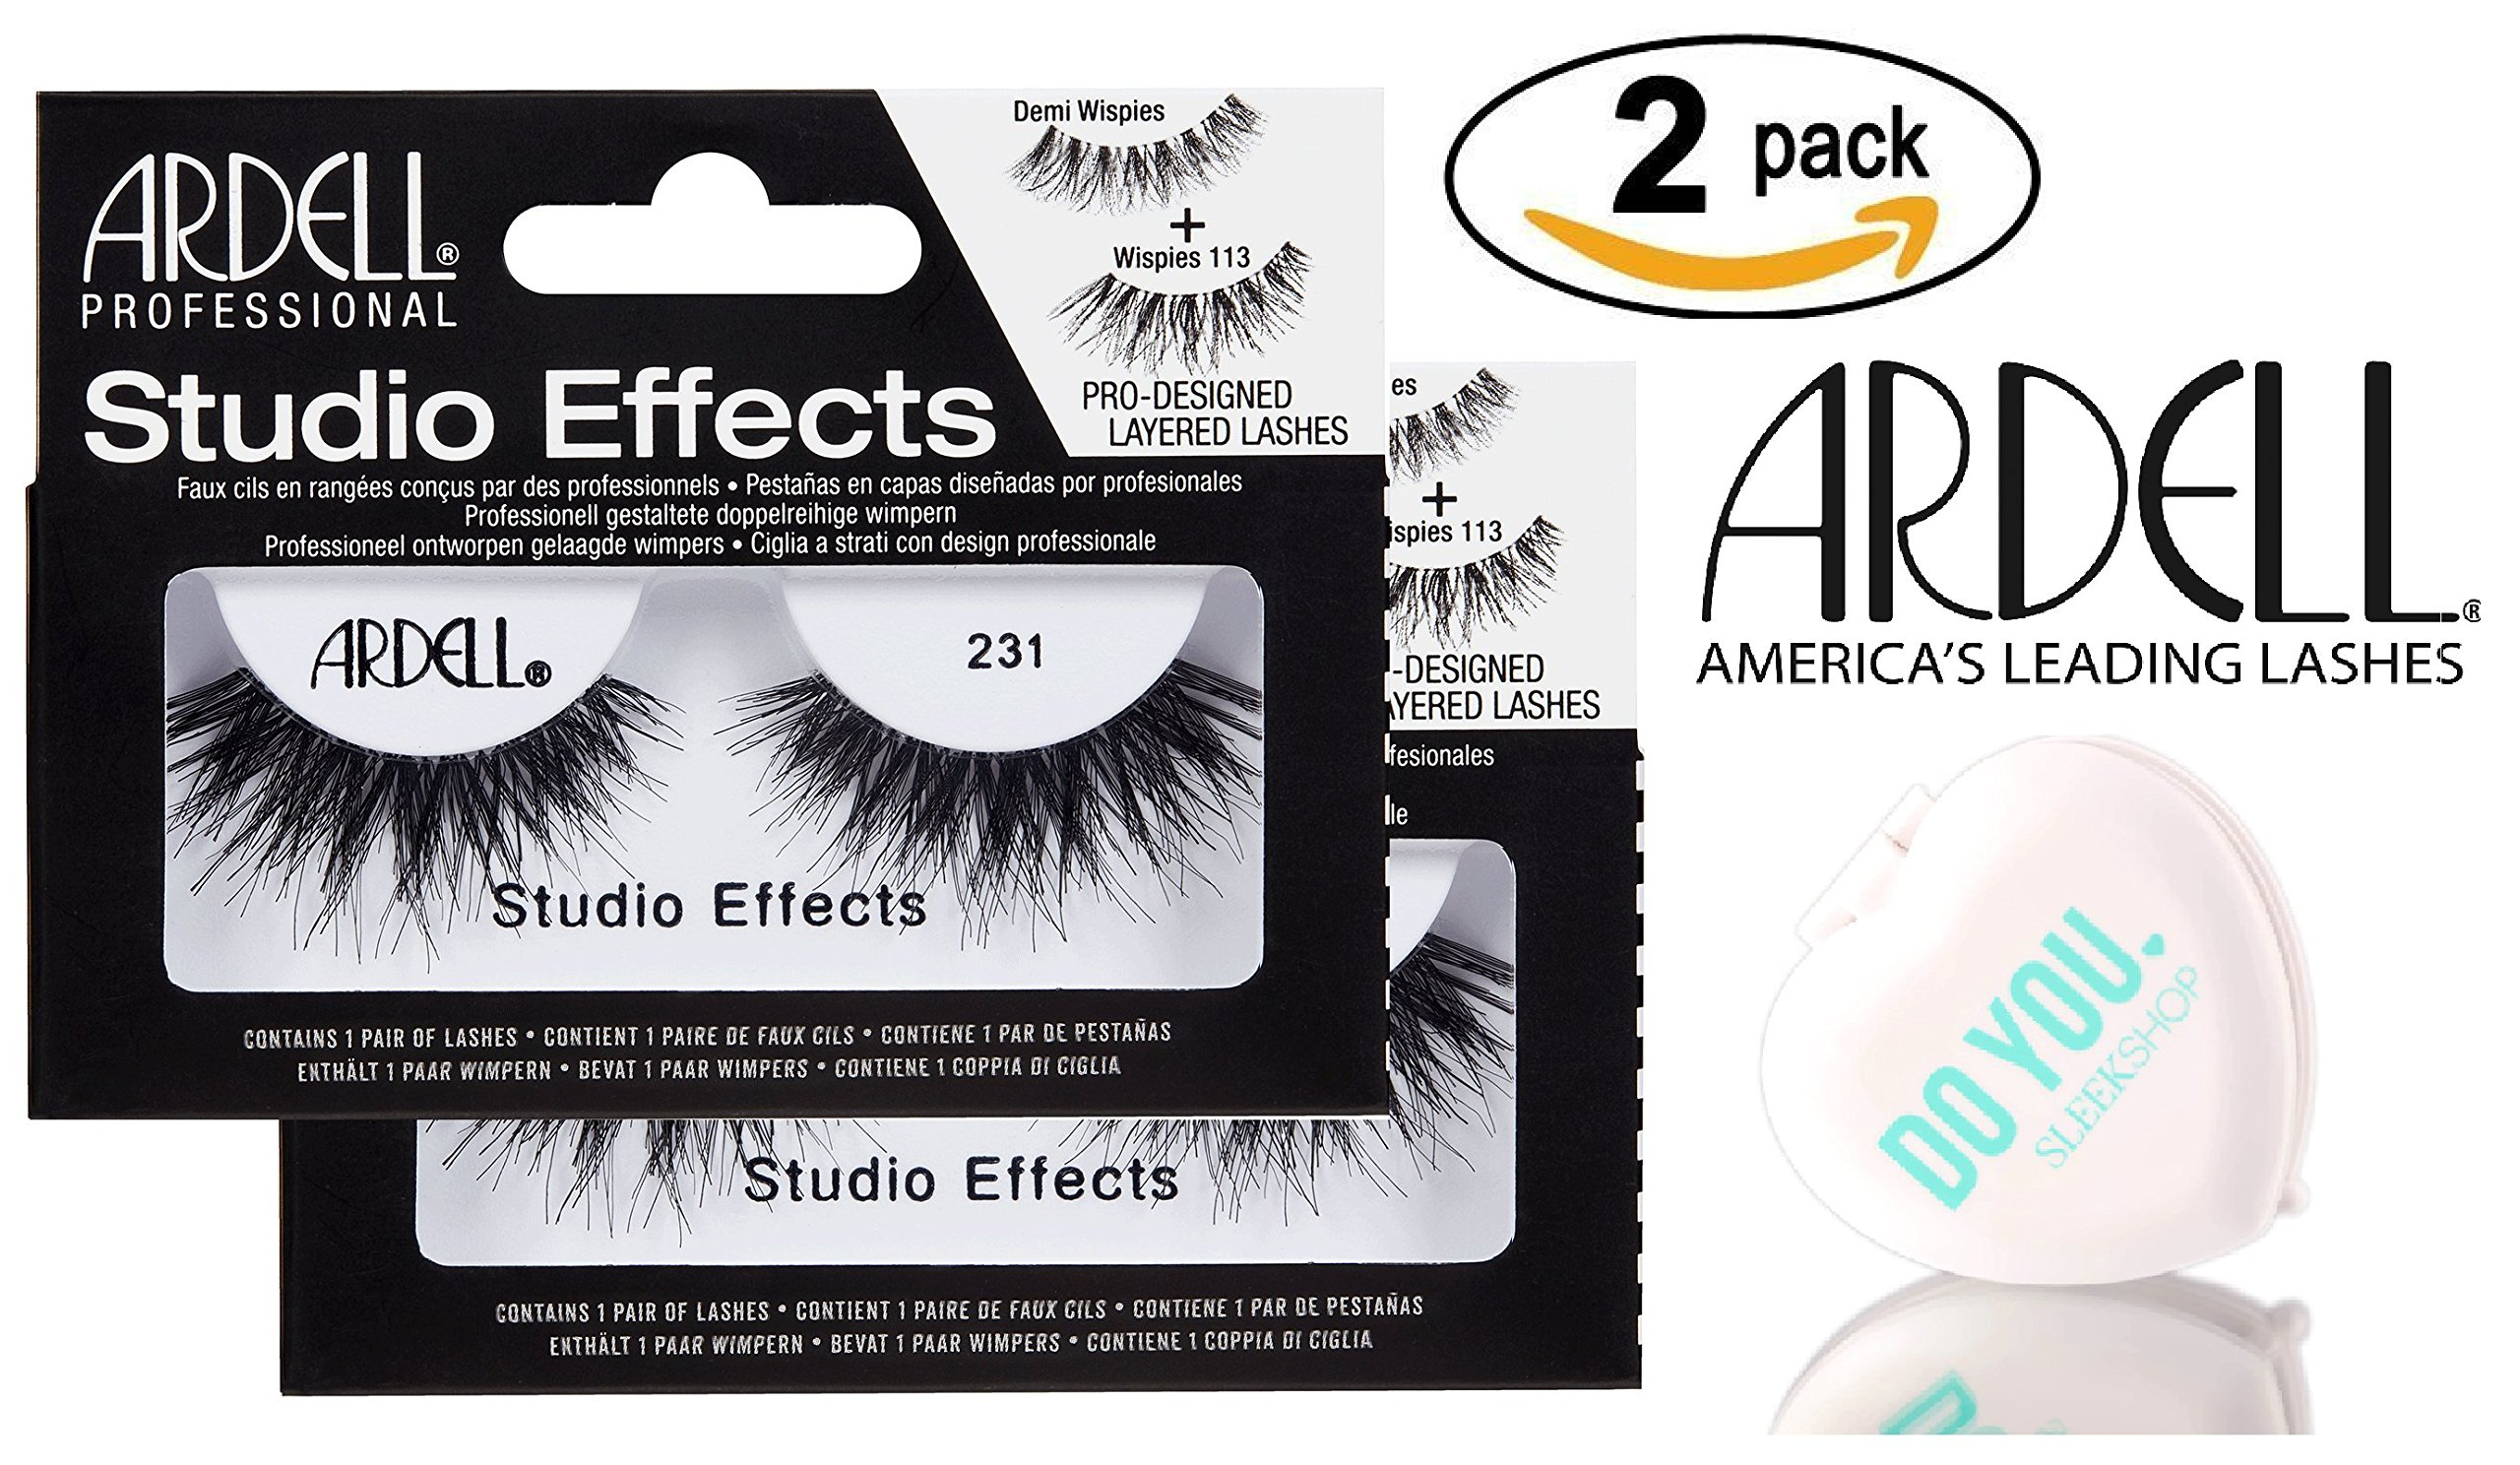 ccf338df959 Amazon.com : Ardell Professional STUDIO EFFECTS Custom Layered ...